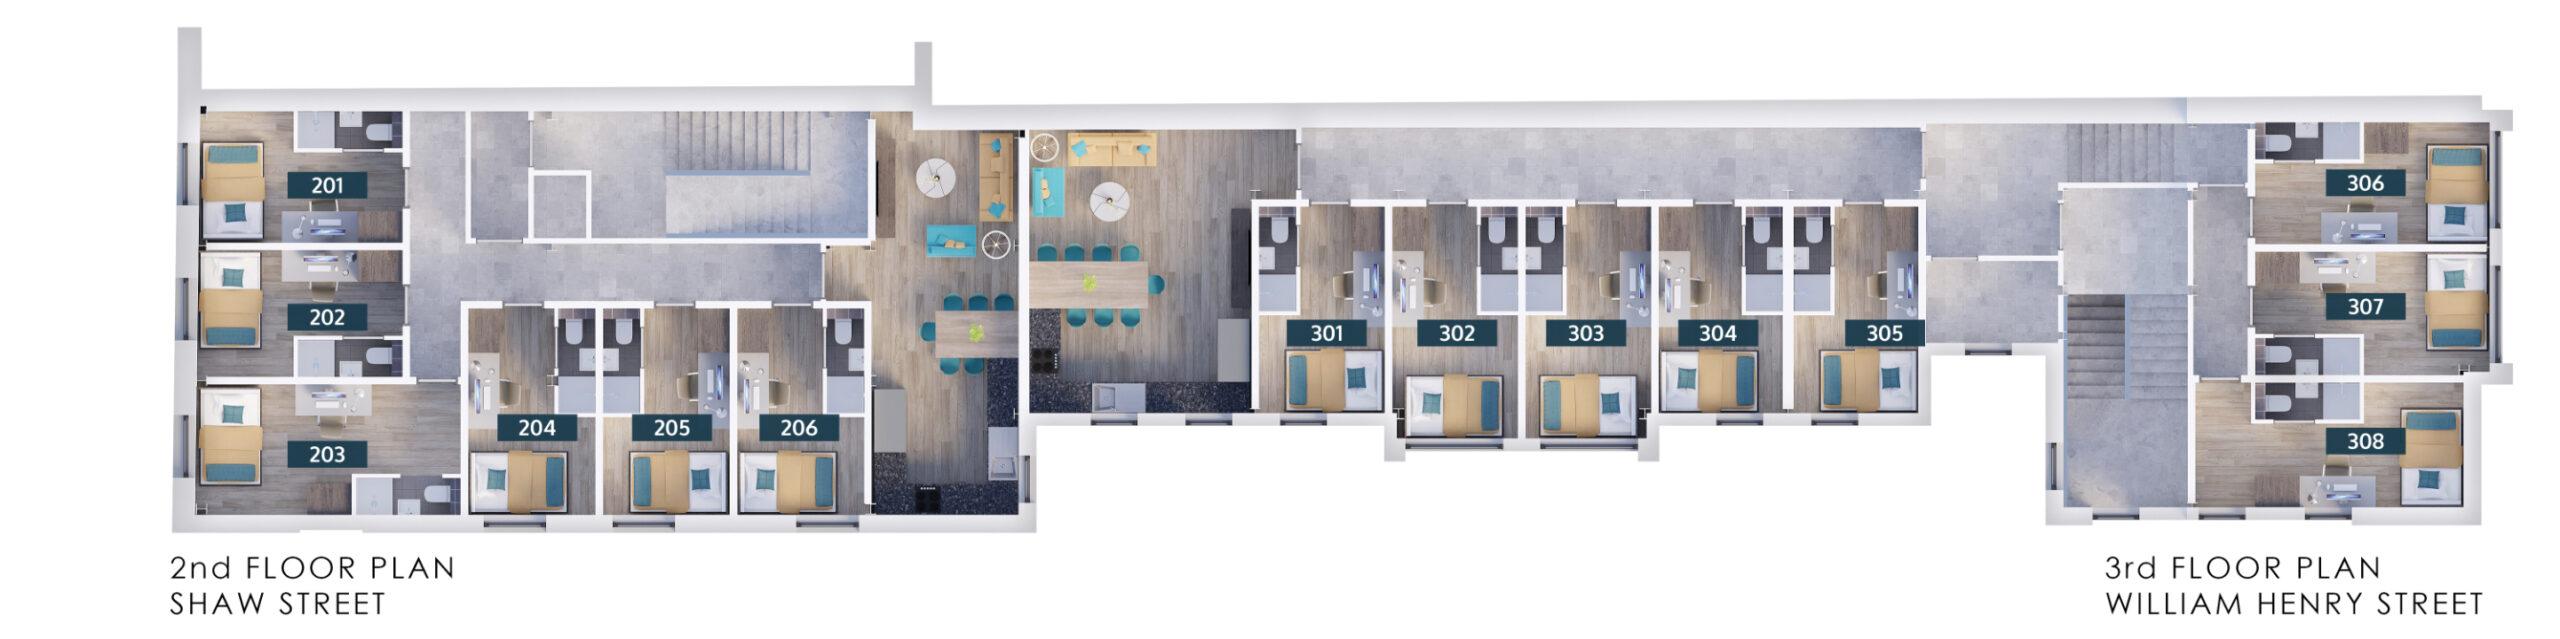 Shaw Street - Second floor plan